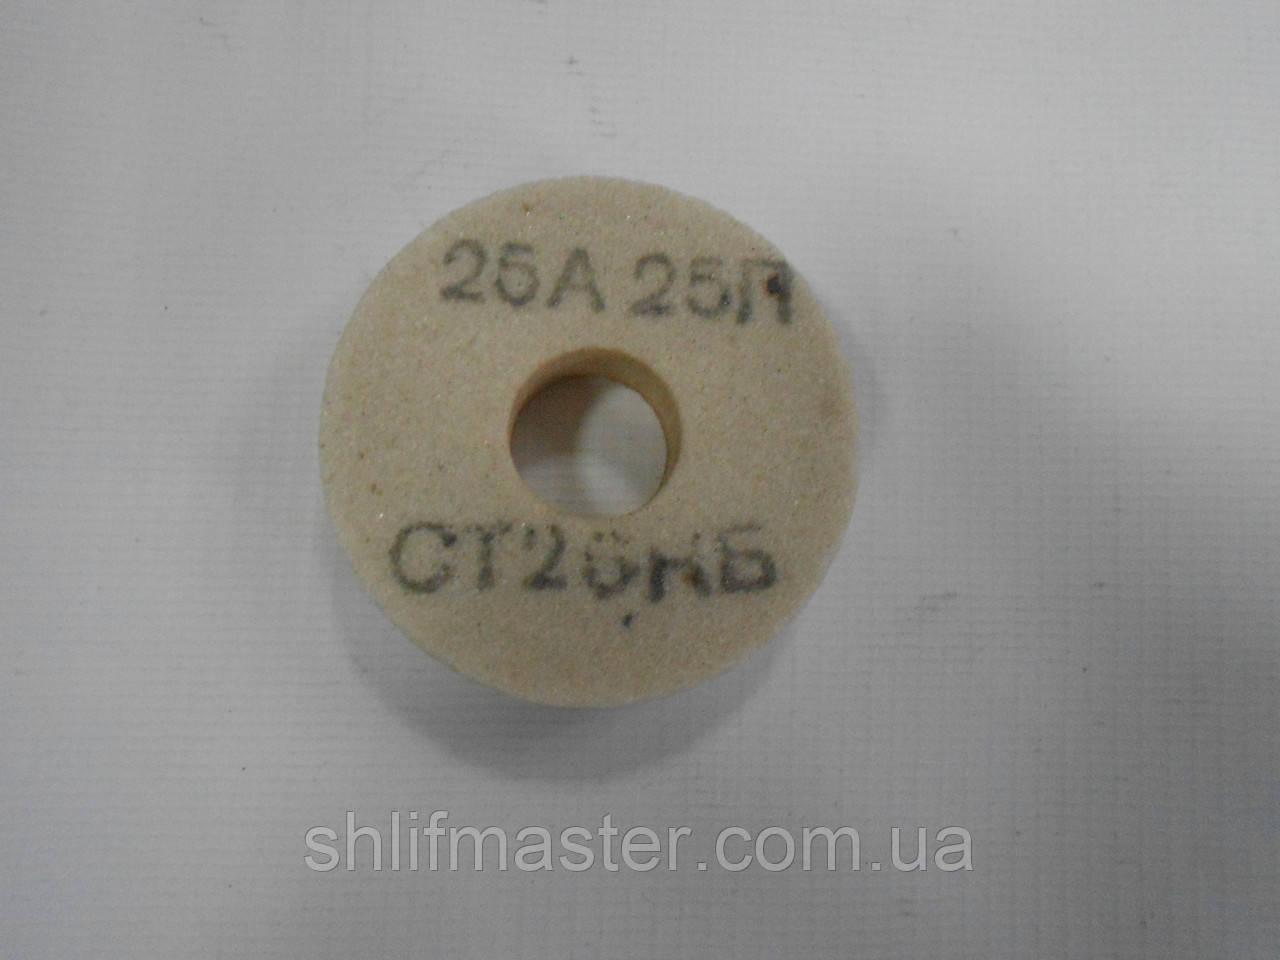 Абразивный круг шлифовальный (электрокорунд белый) 25А ПП 75Х20Х20 25 СТ